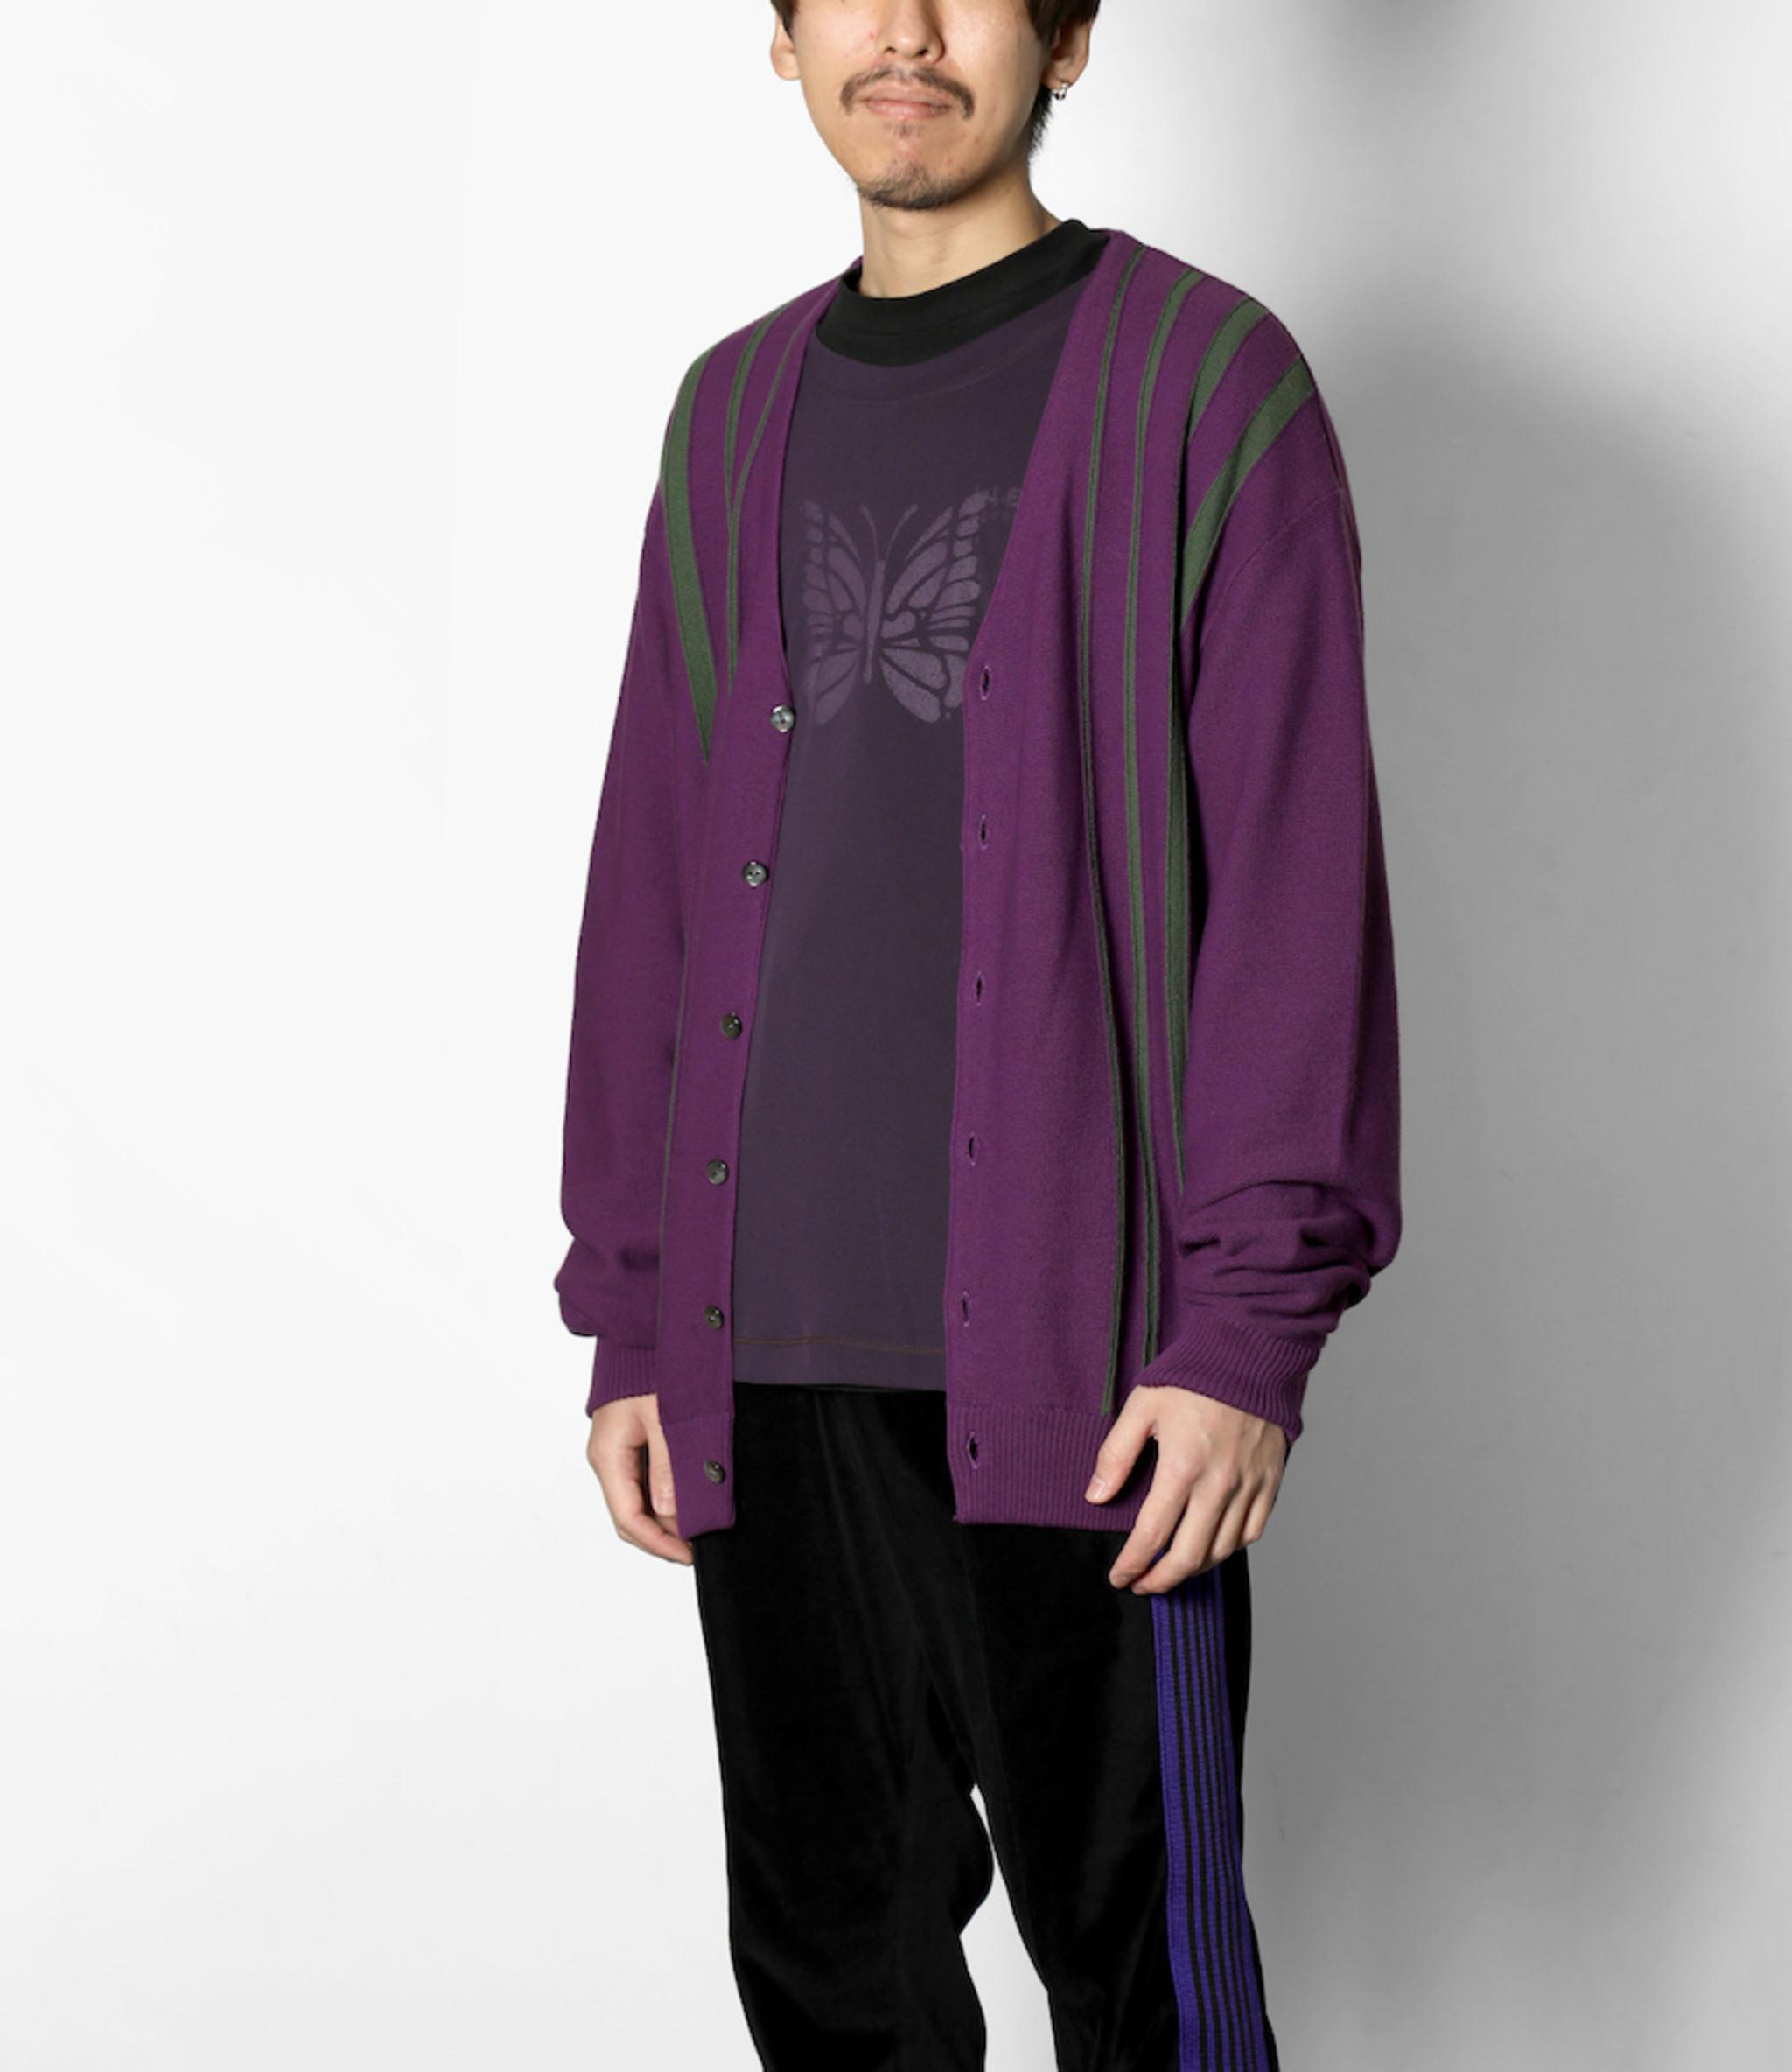 Needles V Neck Cardigan - Crepe Stitch / Stripe - Purple